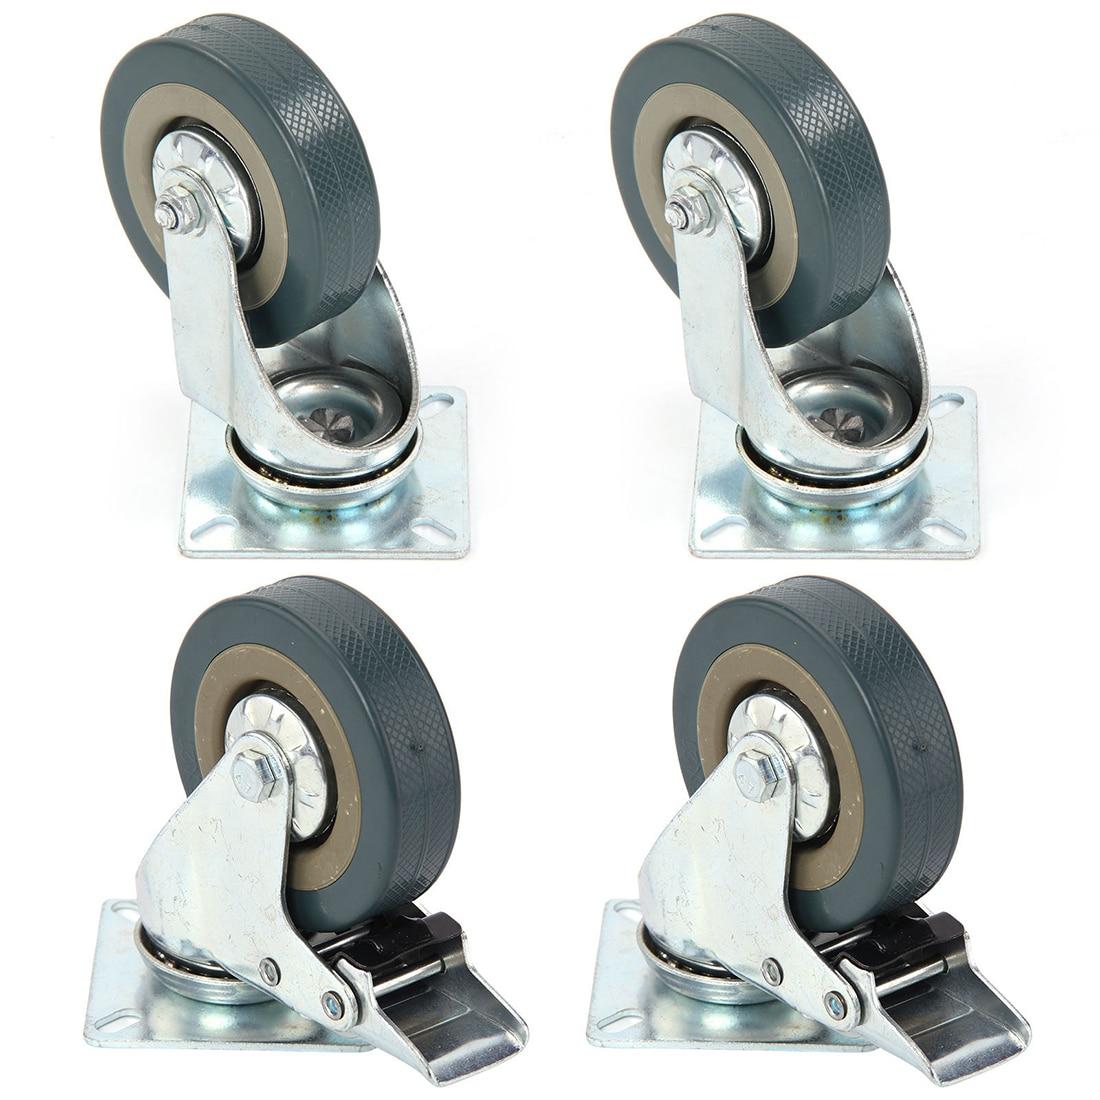 1 Set 75x21mm 50KG  Heavy Duty  Rubber Swivel Castor Wheels Trolley Caster Brake, 2 with brake +2 without brake ys 138no nc ansi standard heavy duty electric strike size 124 x 32 x 33 mm